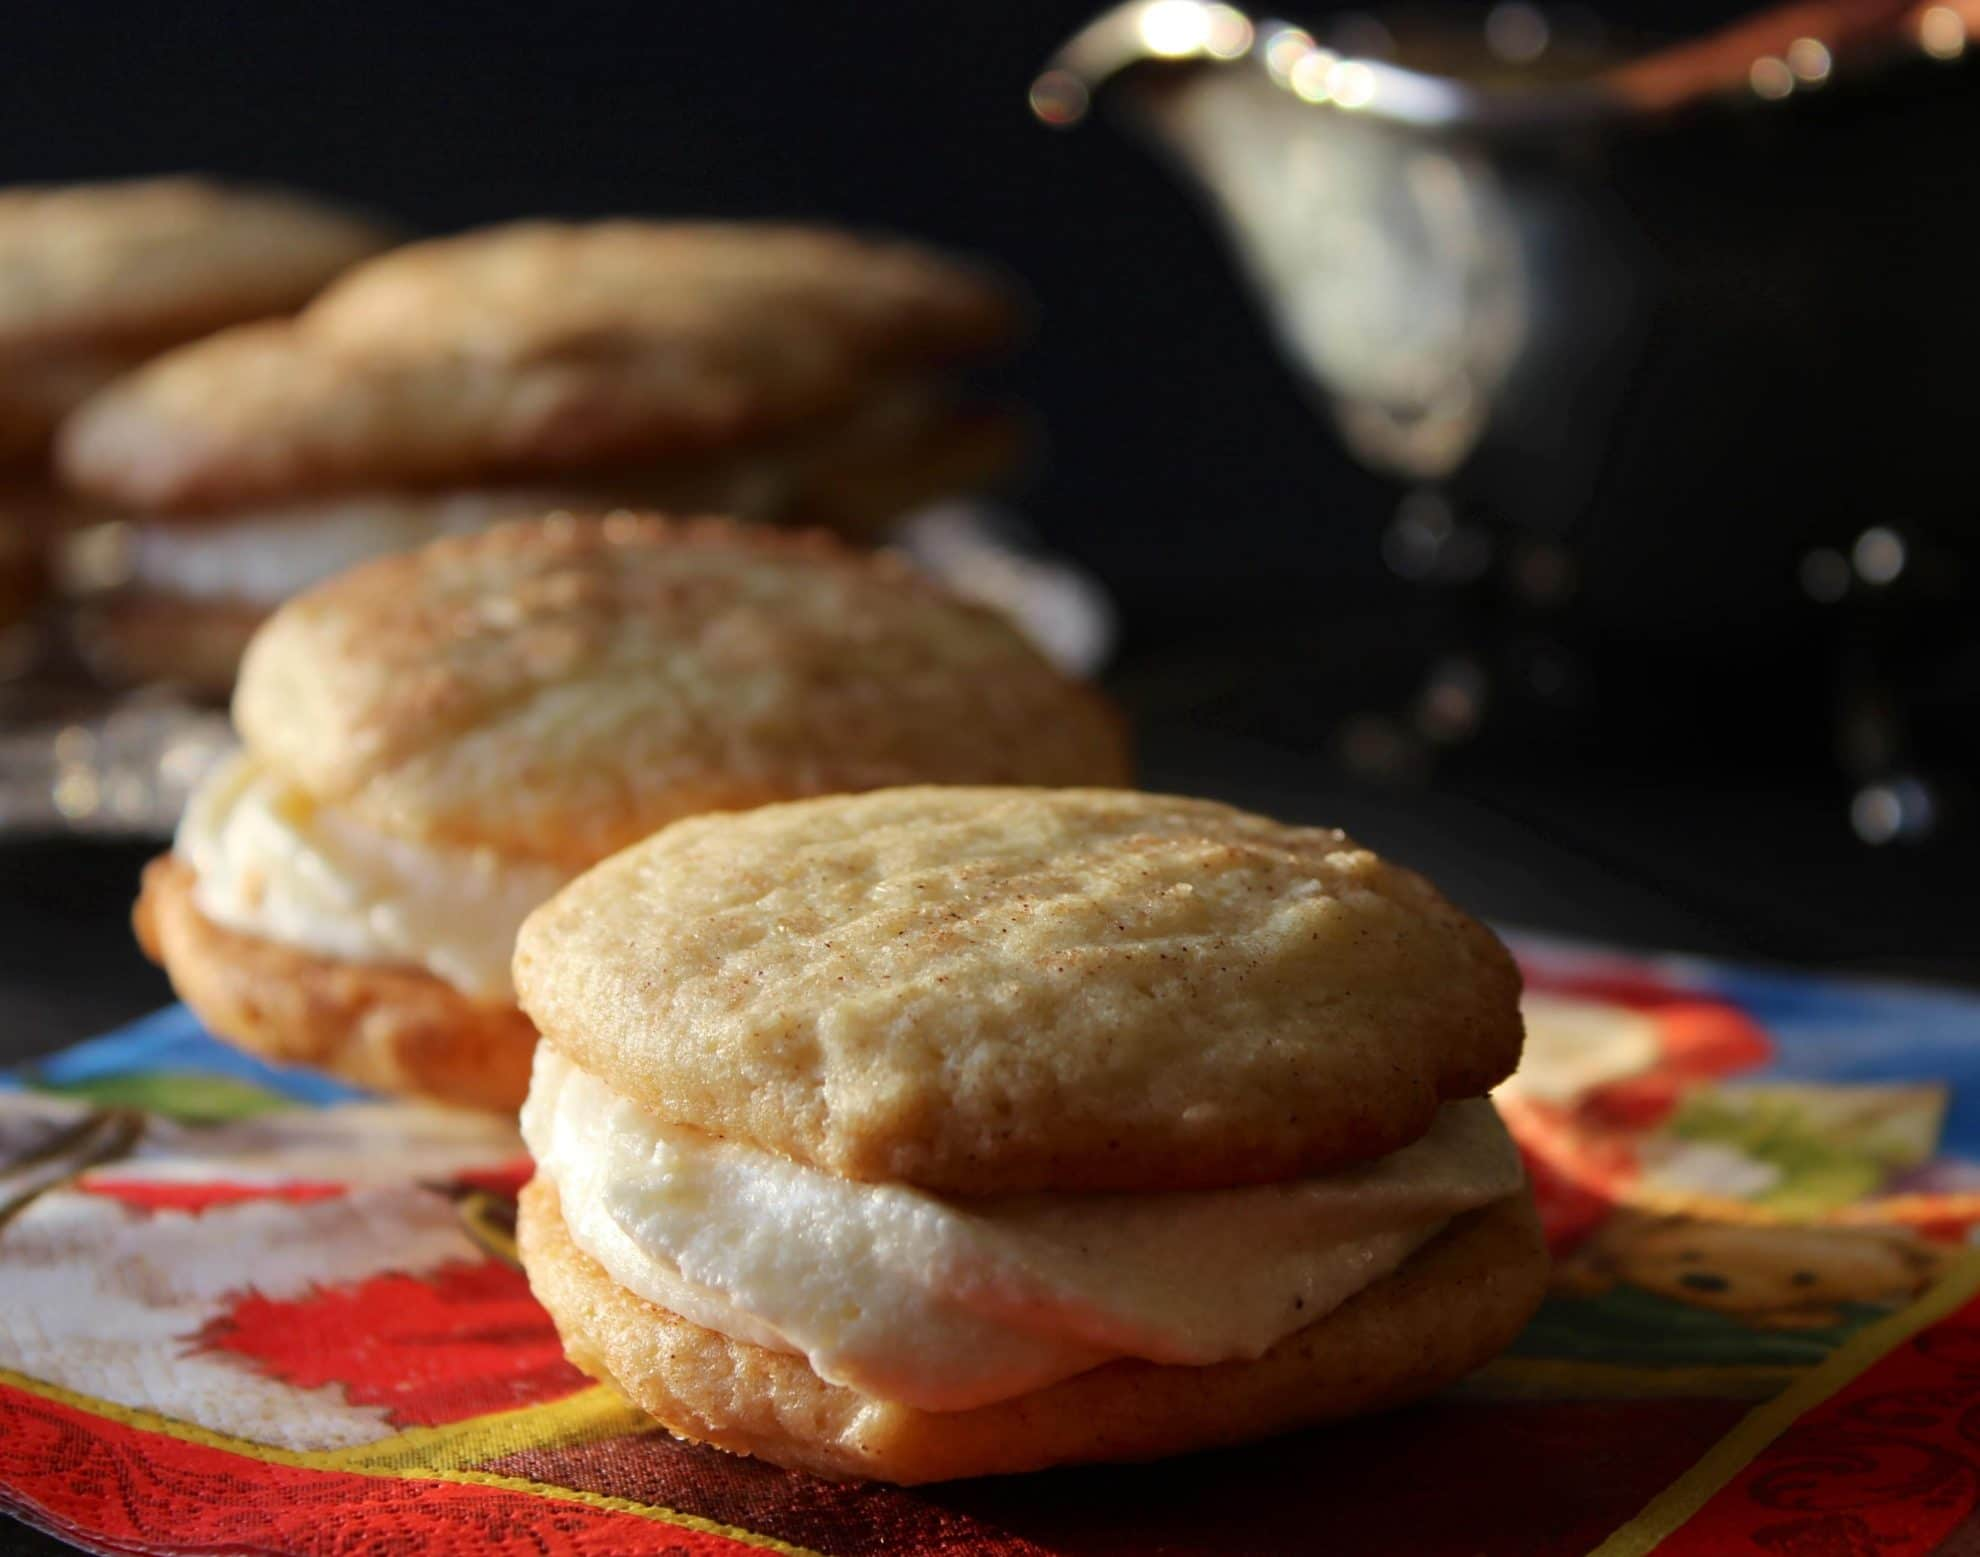 The Twelve Days of Cookies – Snickerdoodle Sandwich Cookies with Eggnog Buttercream